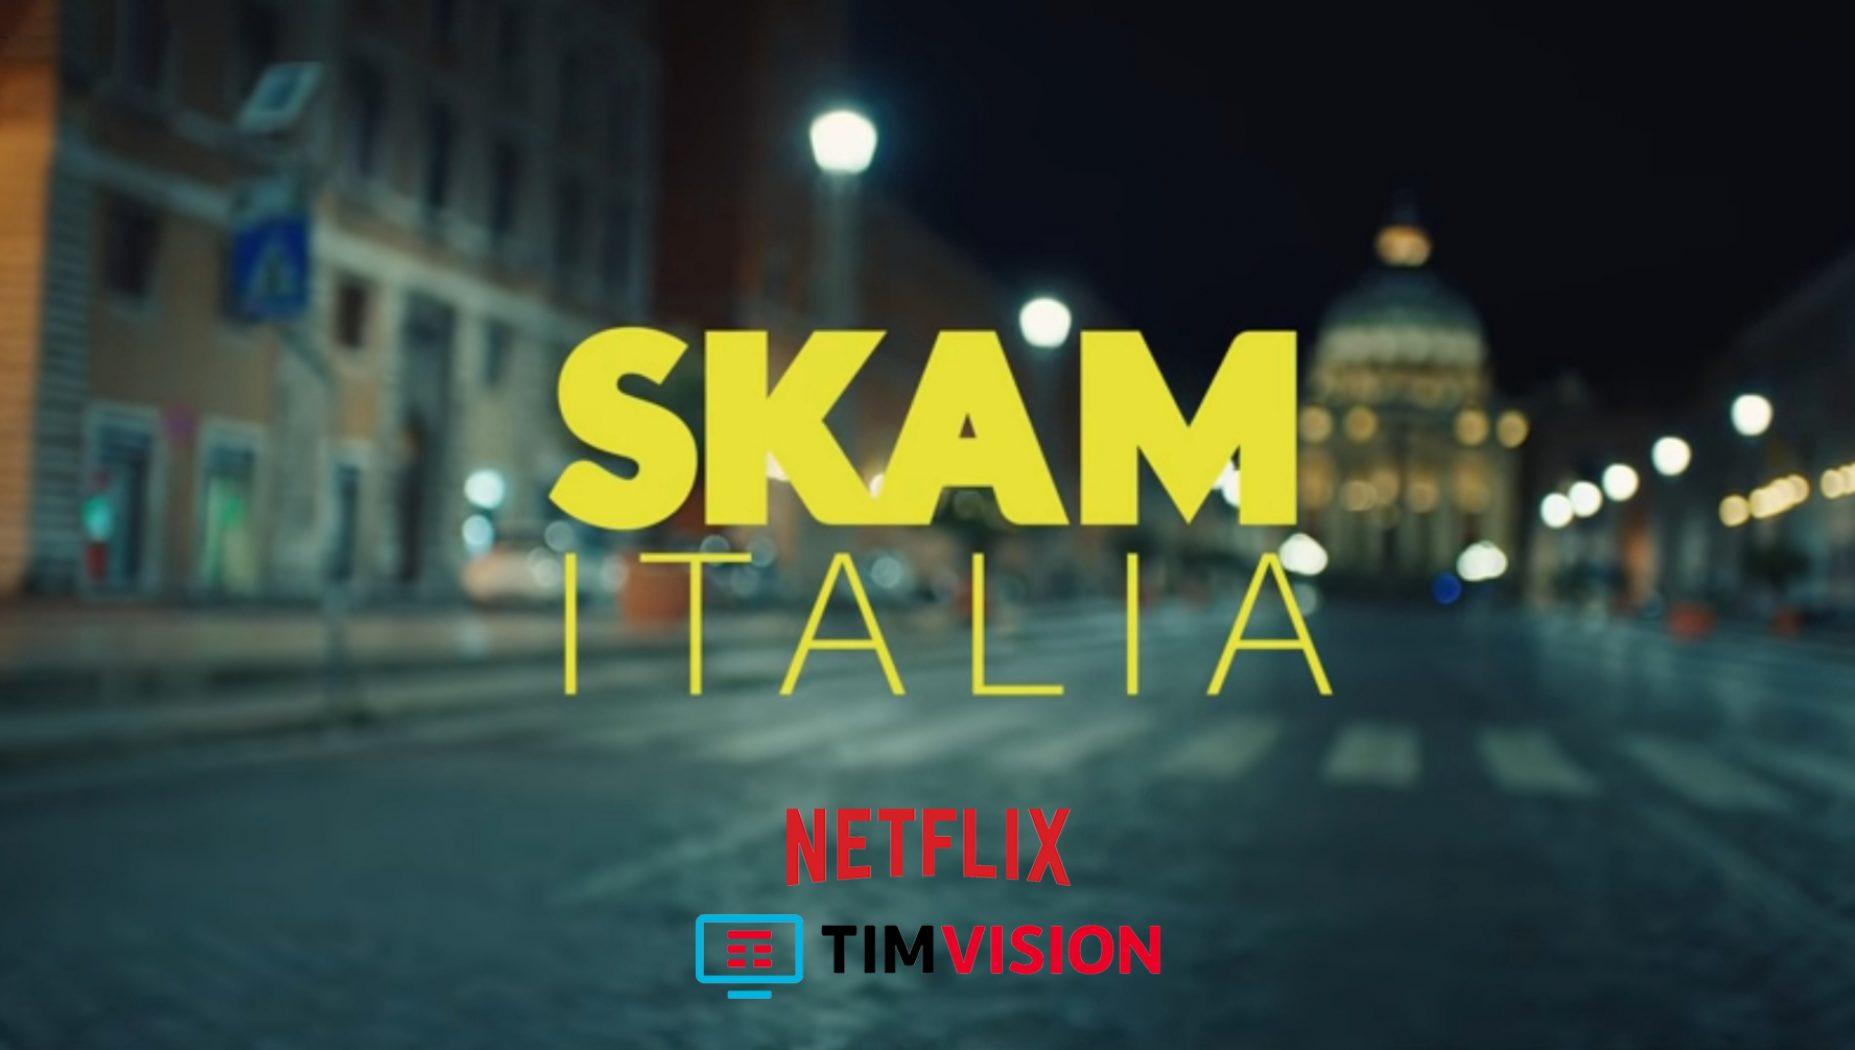 skam-italia-netflix+tim